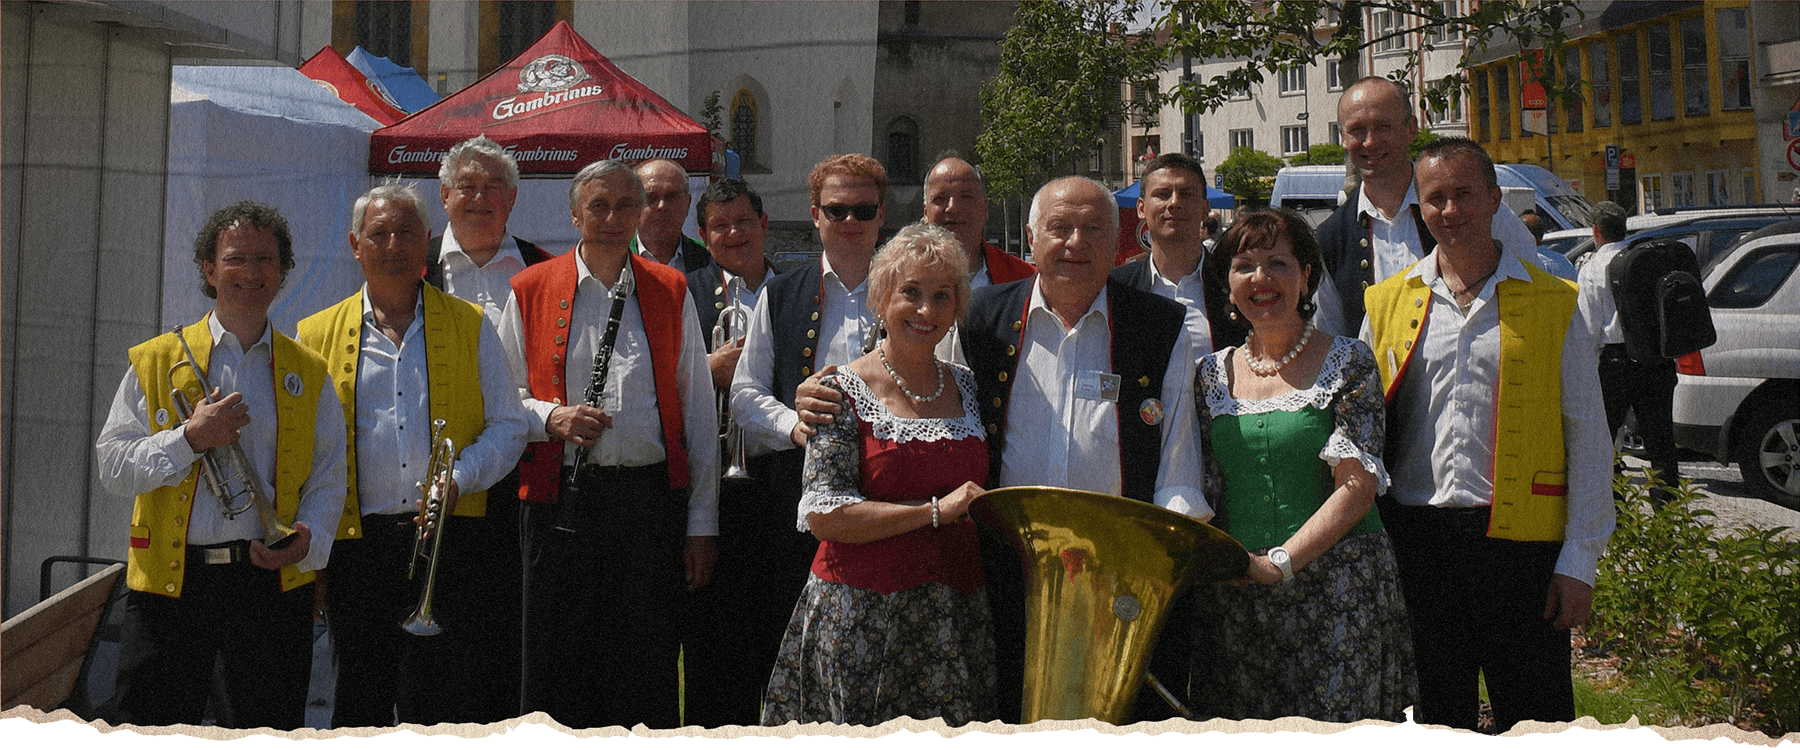 Veselka und Ladislav Kubes